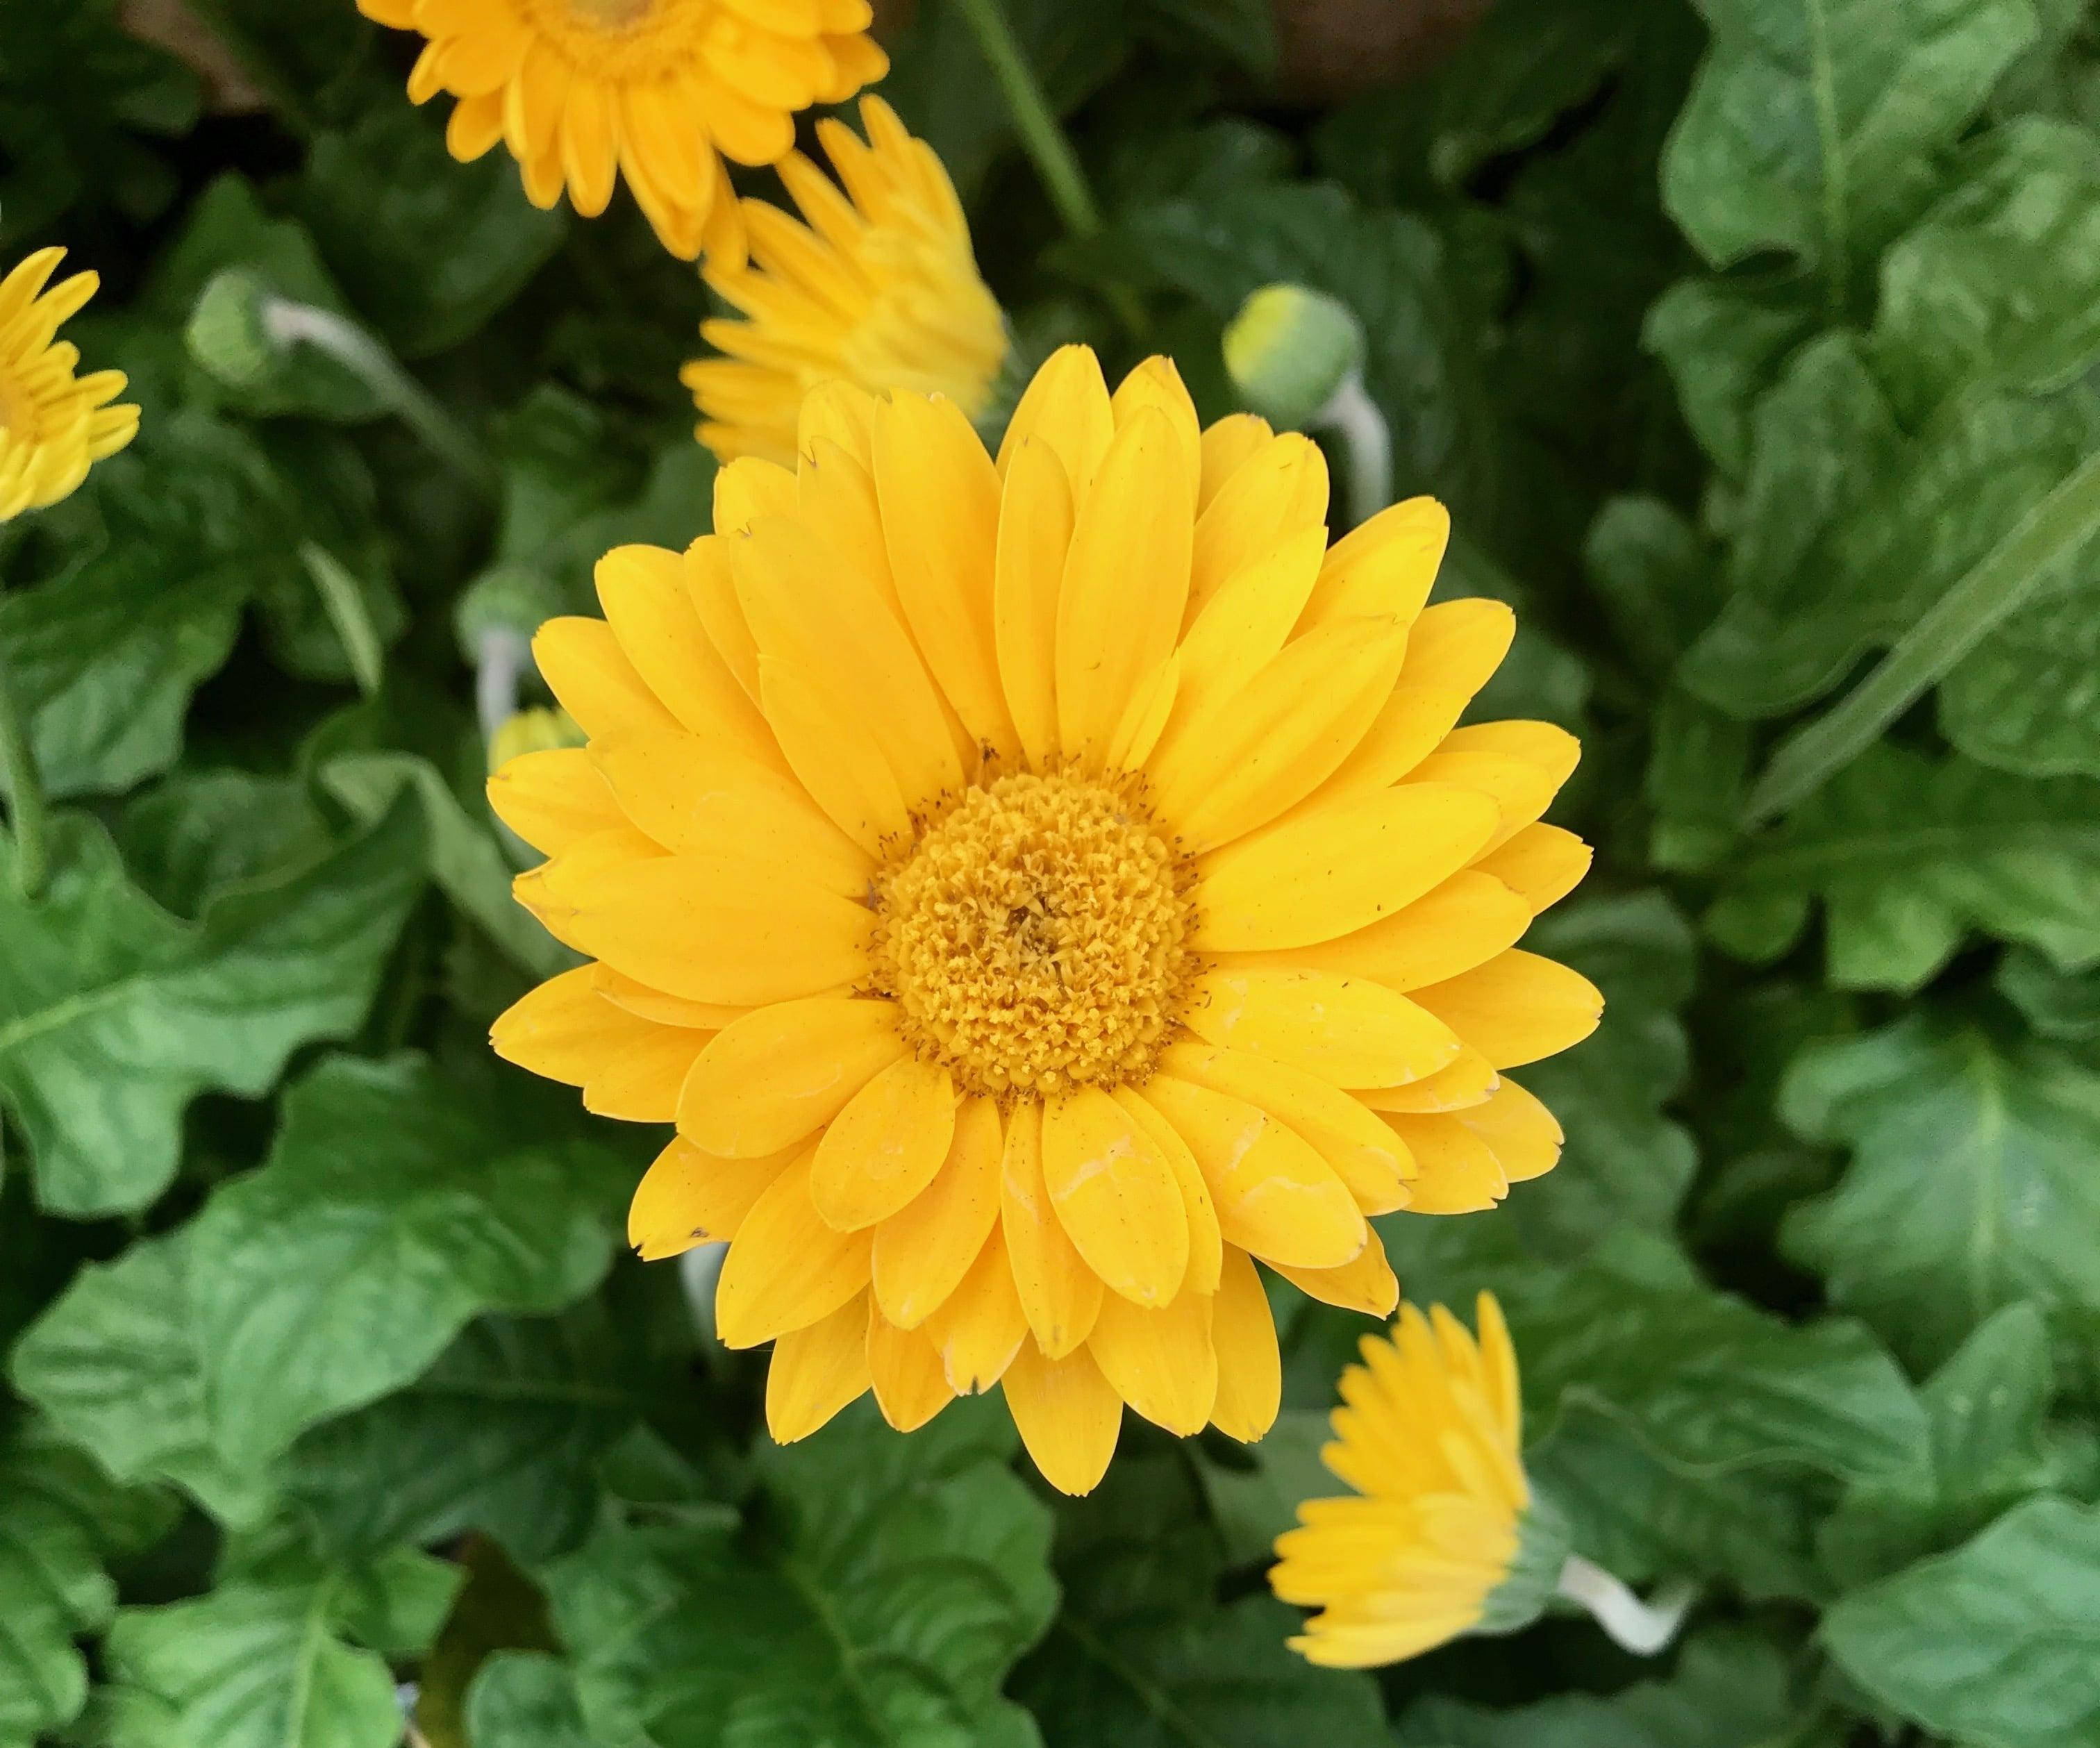 15 Full-Sun Perennials for Your Garden - Natalie Linda